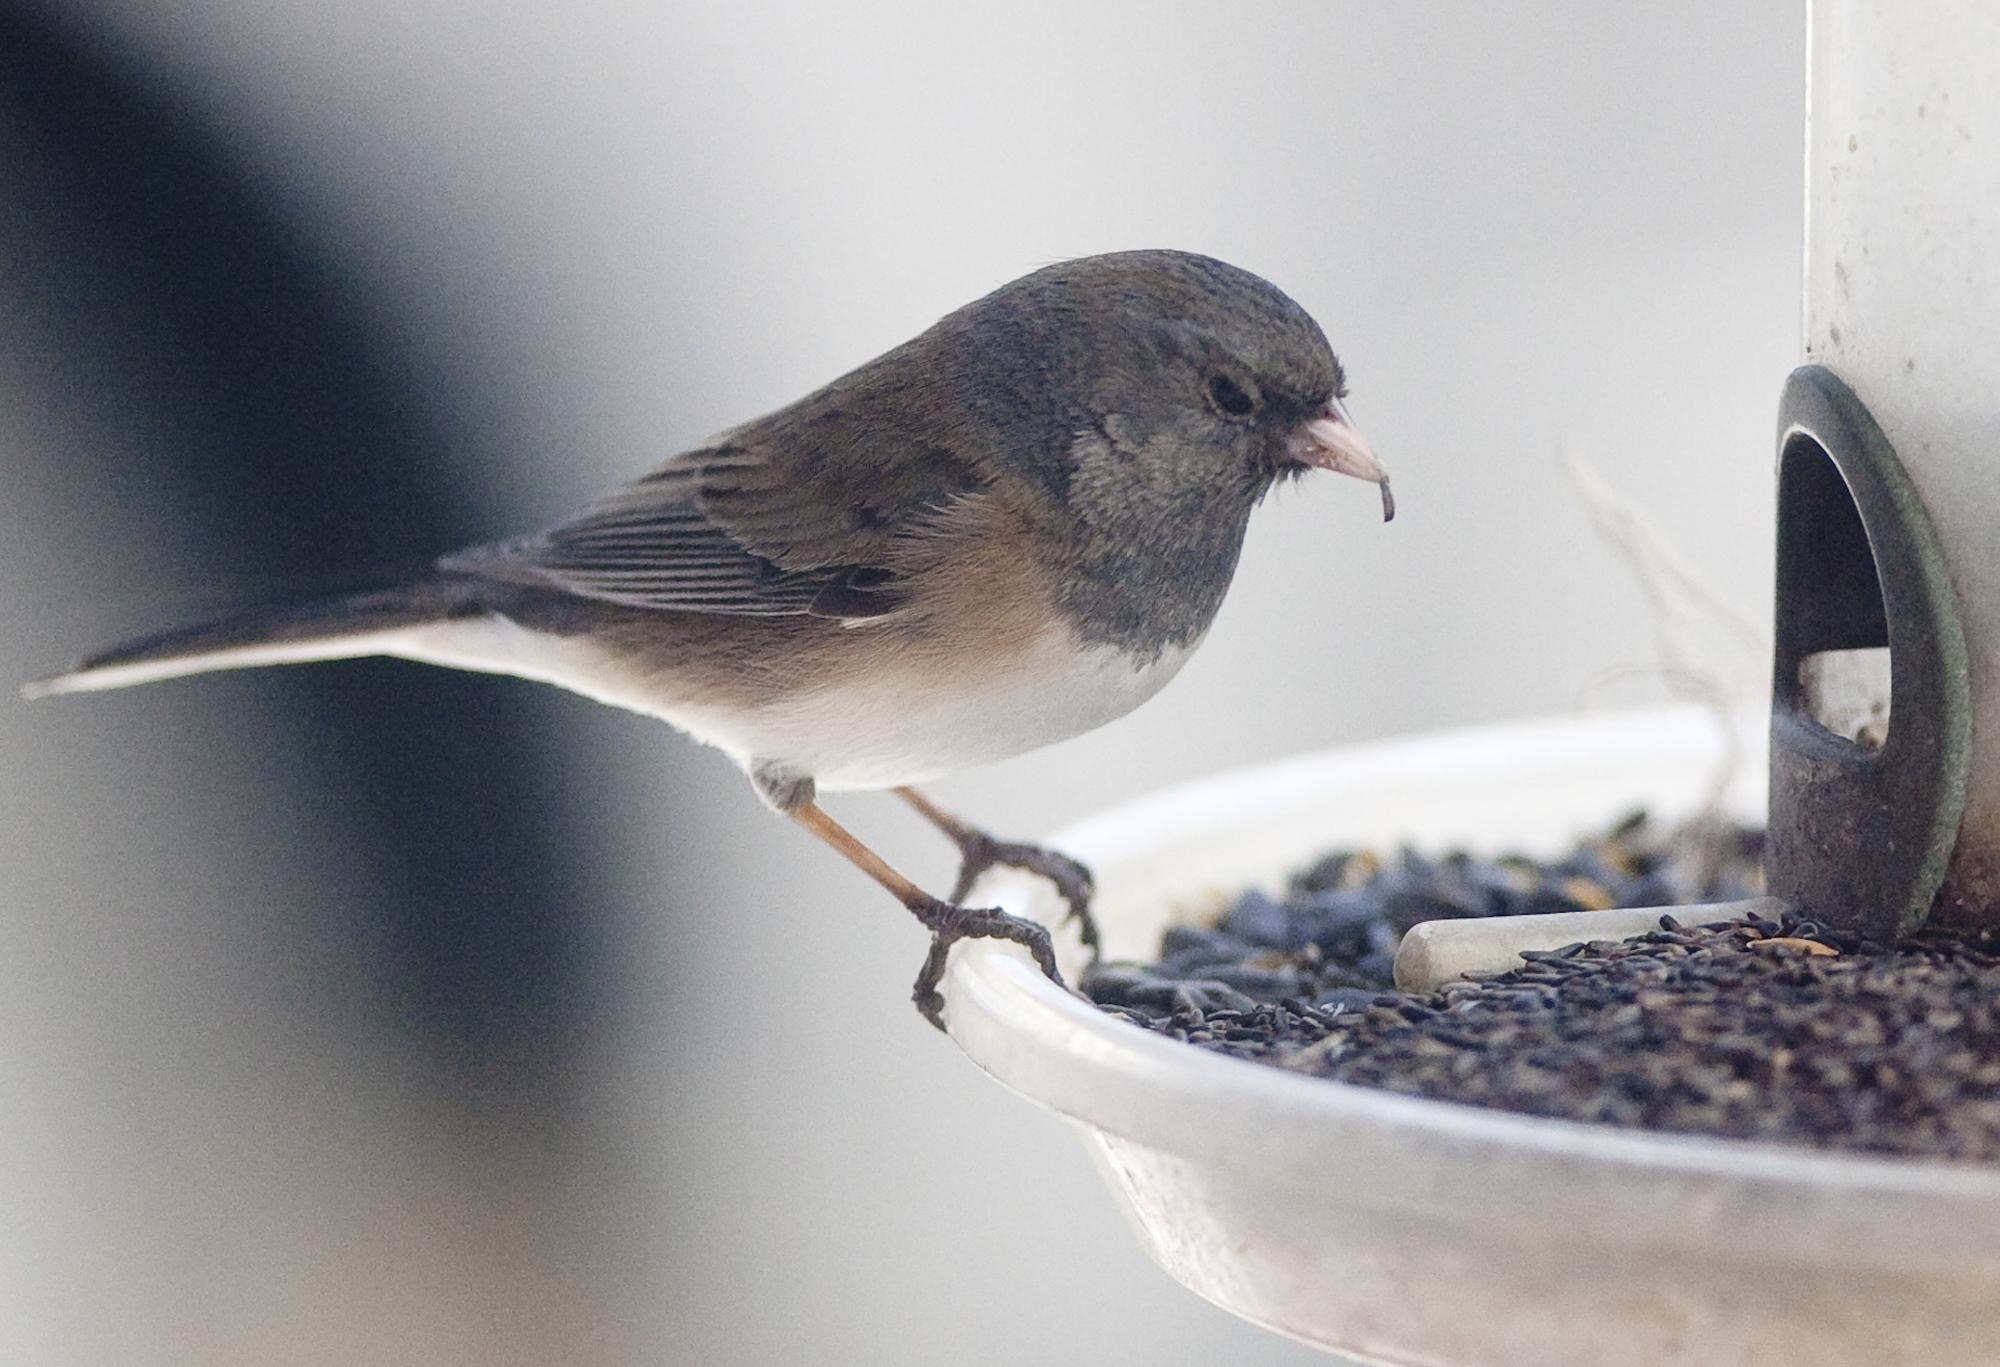 doug clark the bird feeder draws as many opportunists and bullies